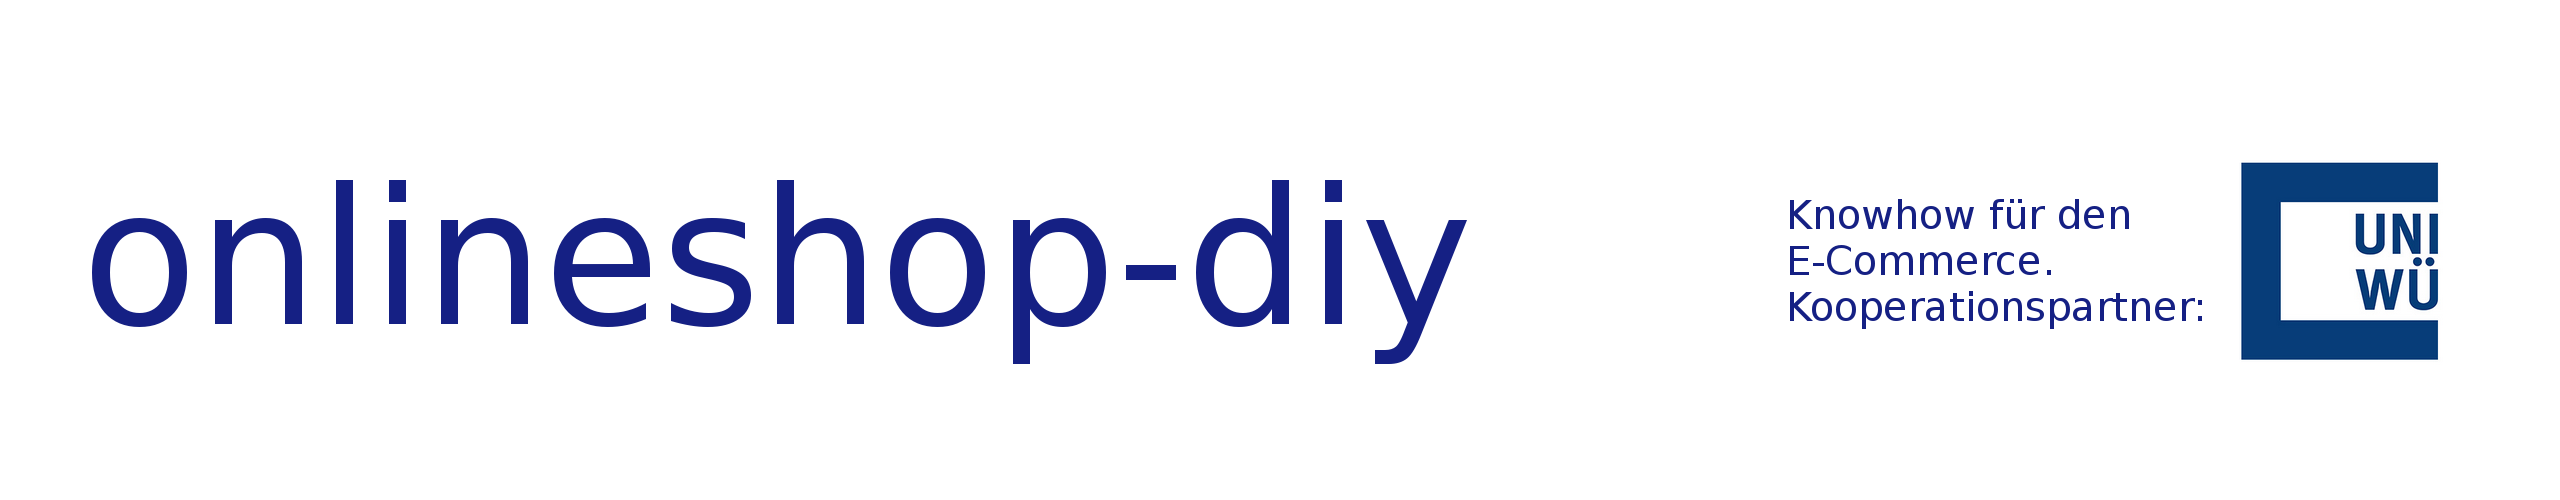 onlineshop-diy